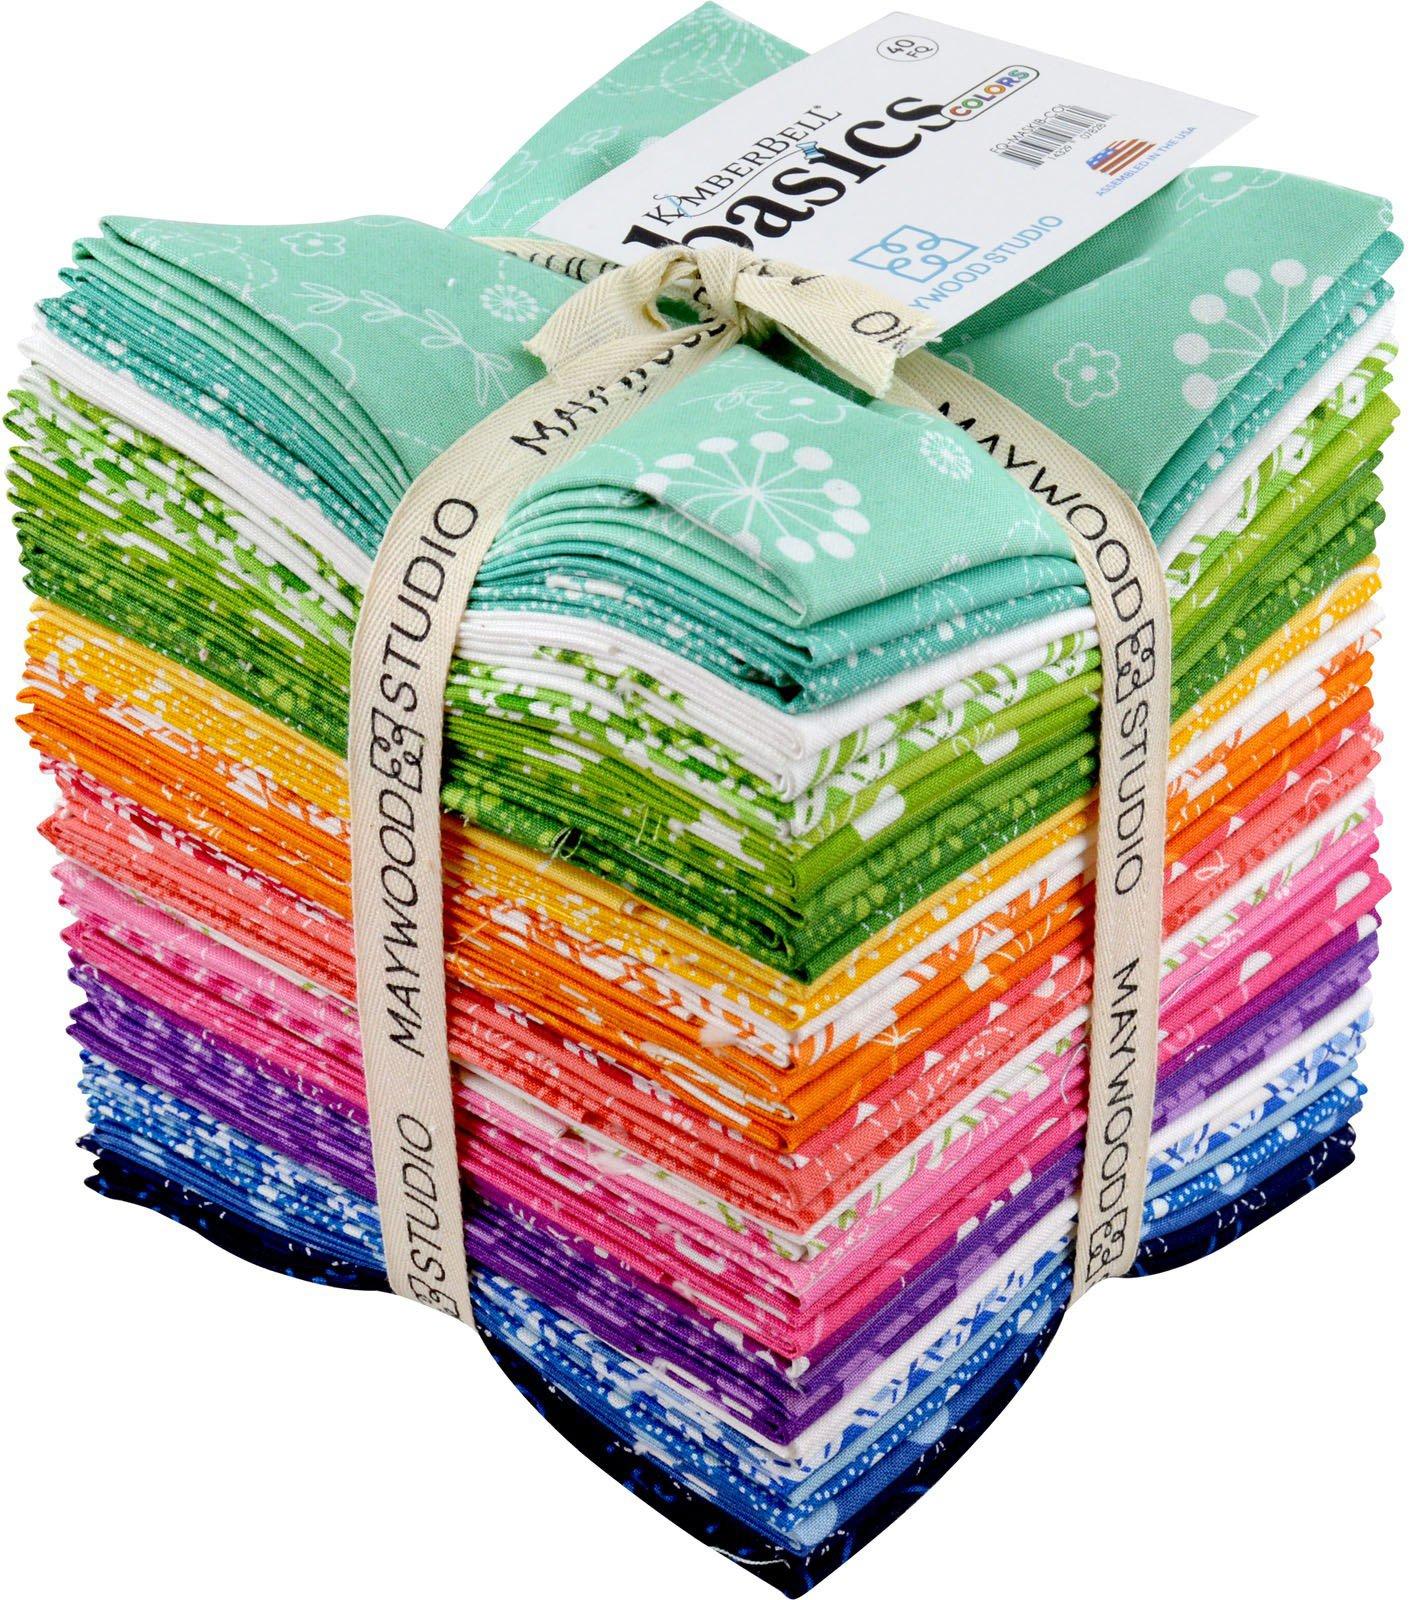 KimberBell Basics Colors 40 Fat Quarters Maywood Studio by Maywood Studio (Image #1)